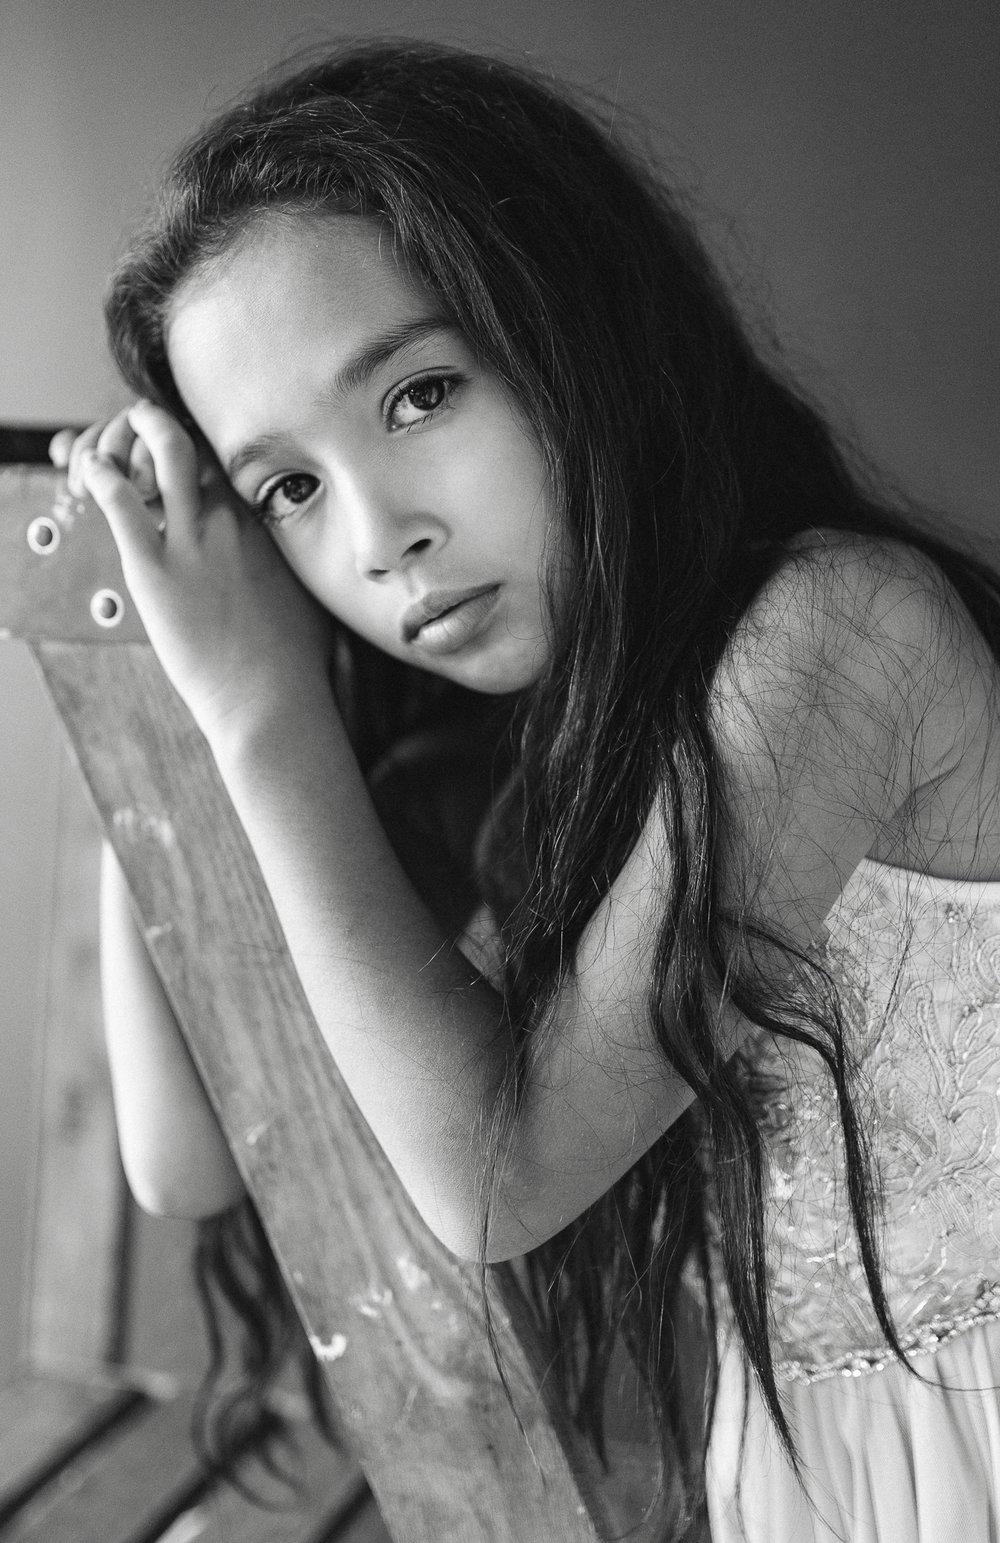 wallingford_children_portrait_photographer_20.jpg